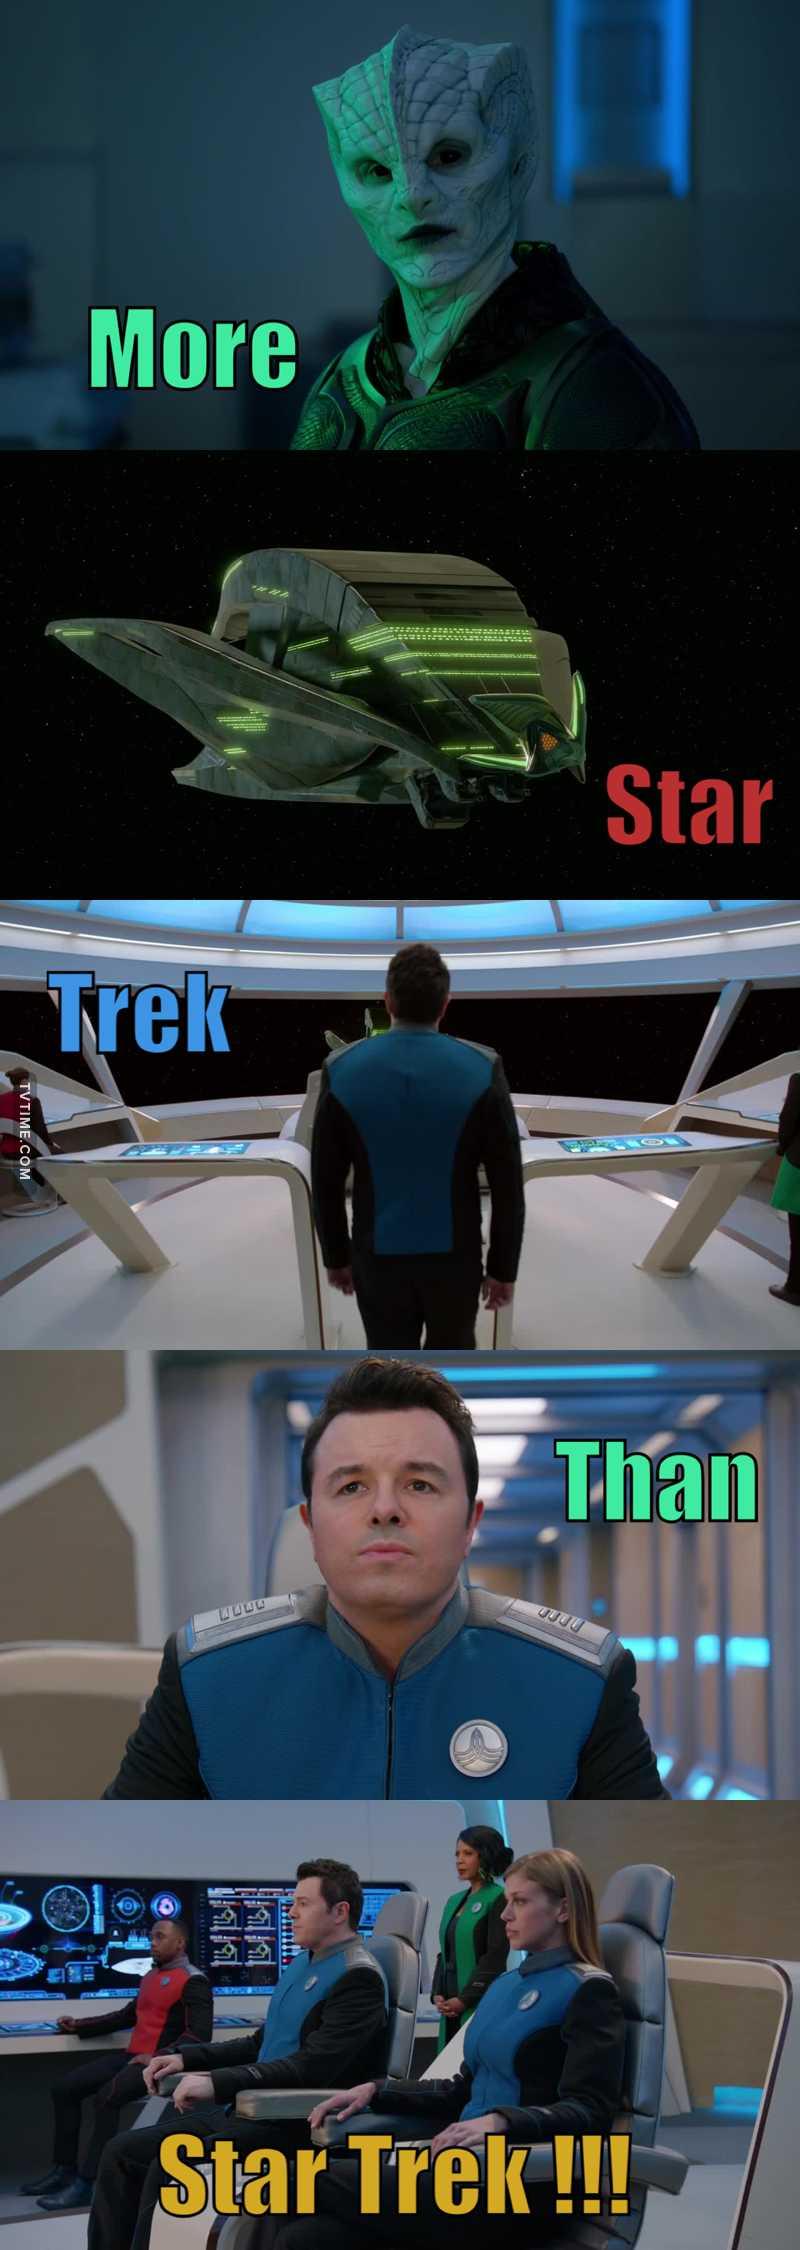 More Star Trek than bloody Star Trek Discovery